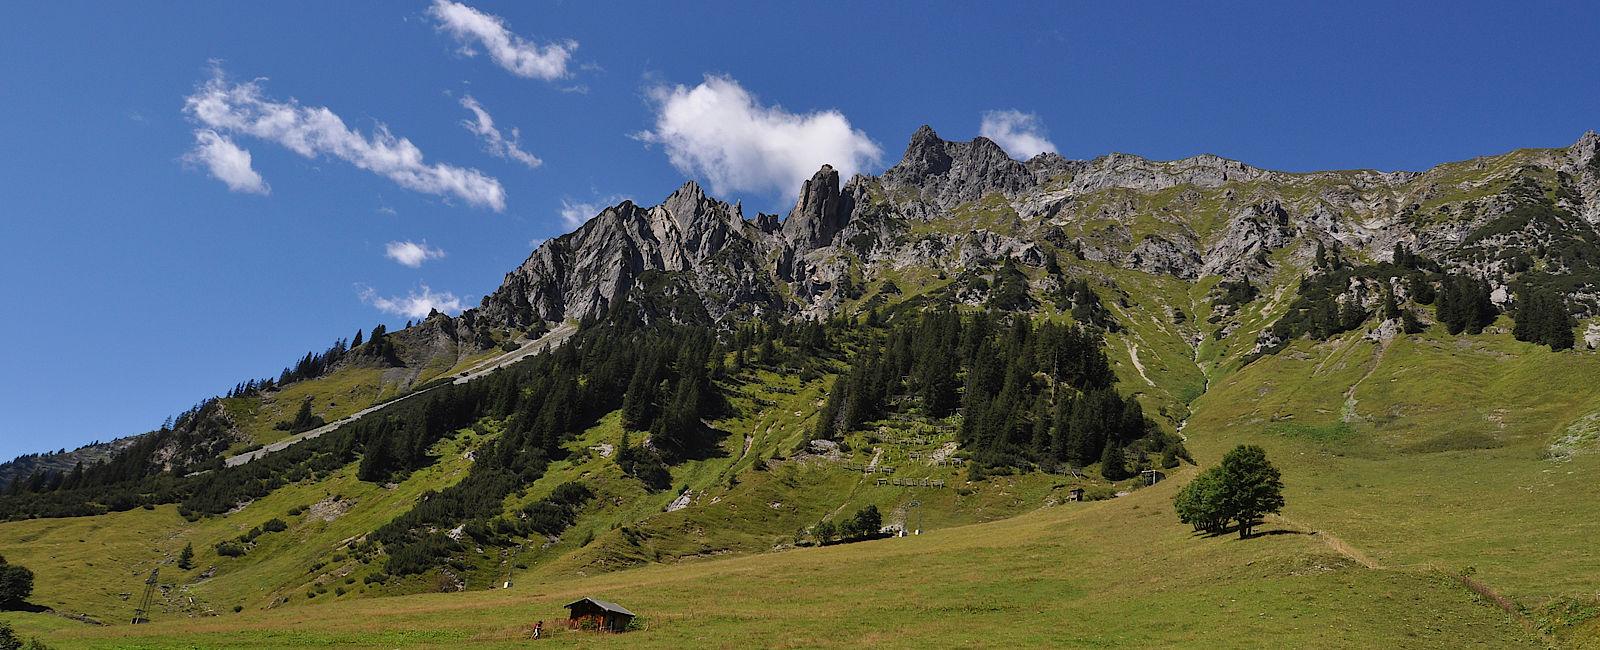 Arlberg - Connoisseur Circle Destinationen im Check